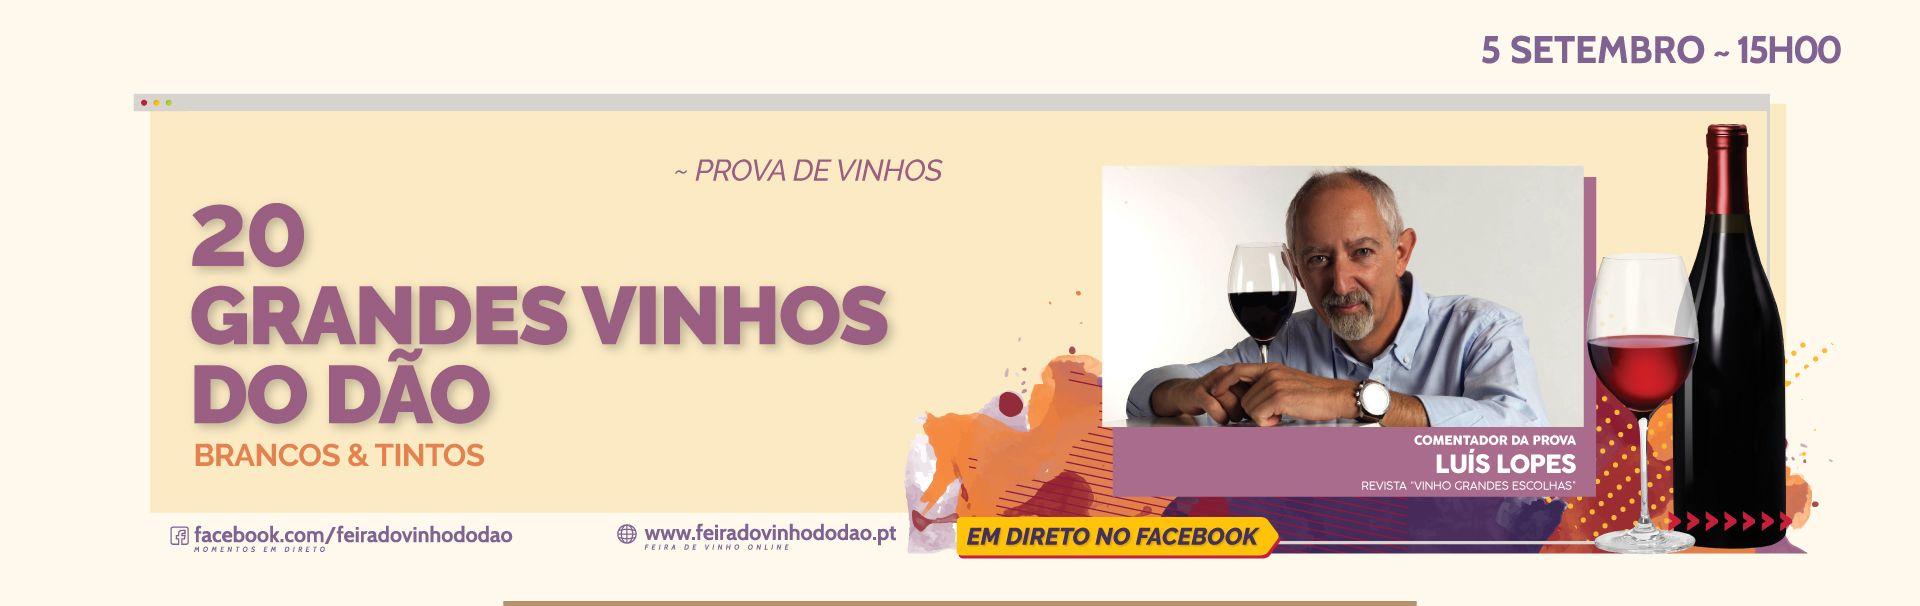 banner_20-grandes-vinhos.jpg